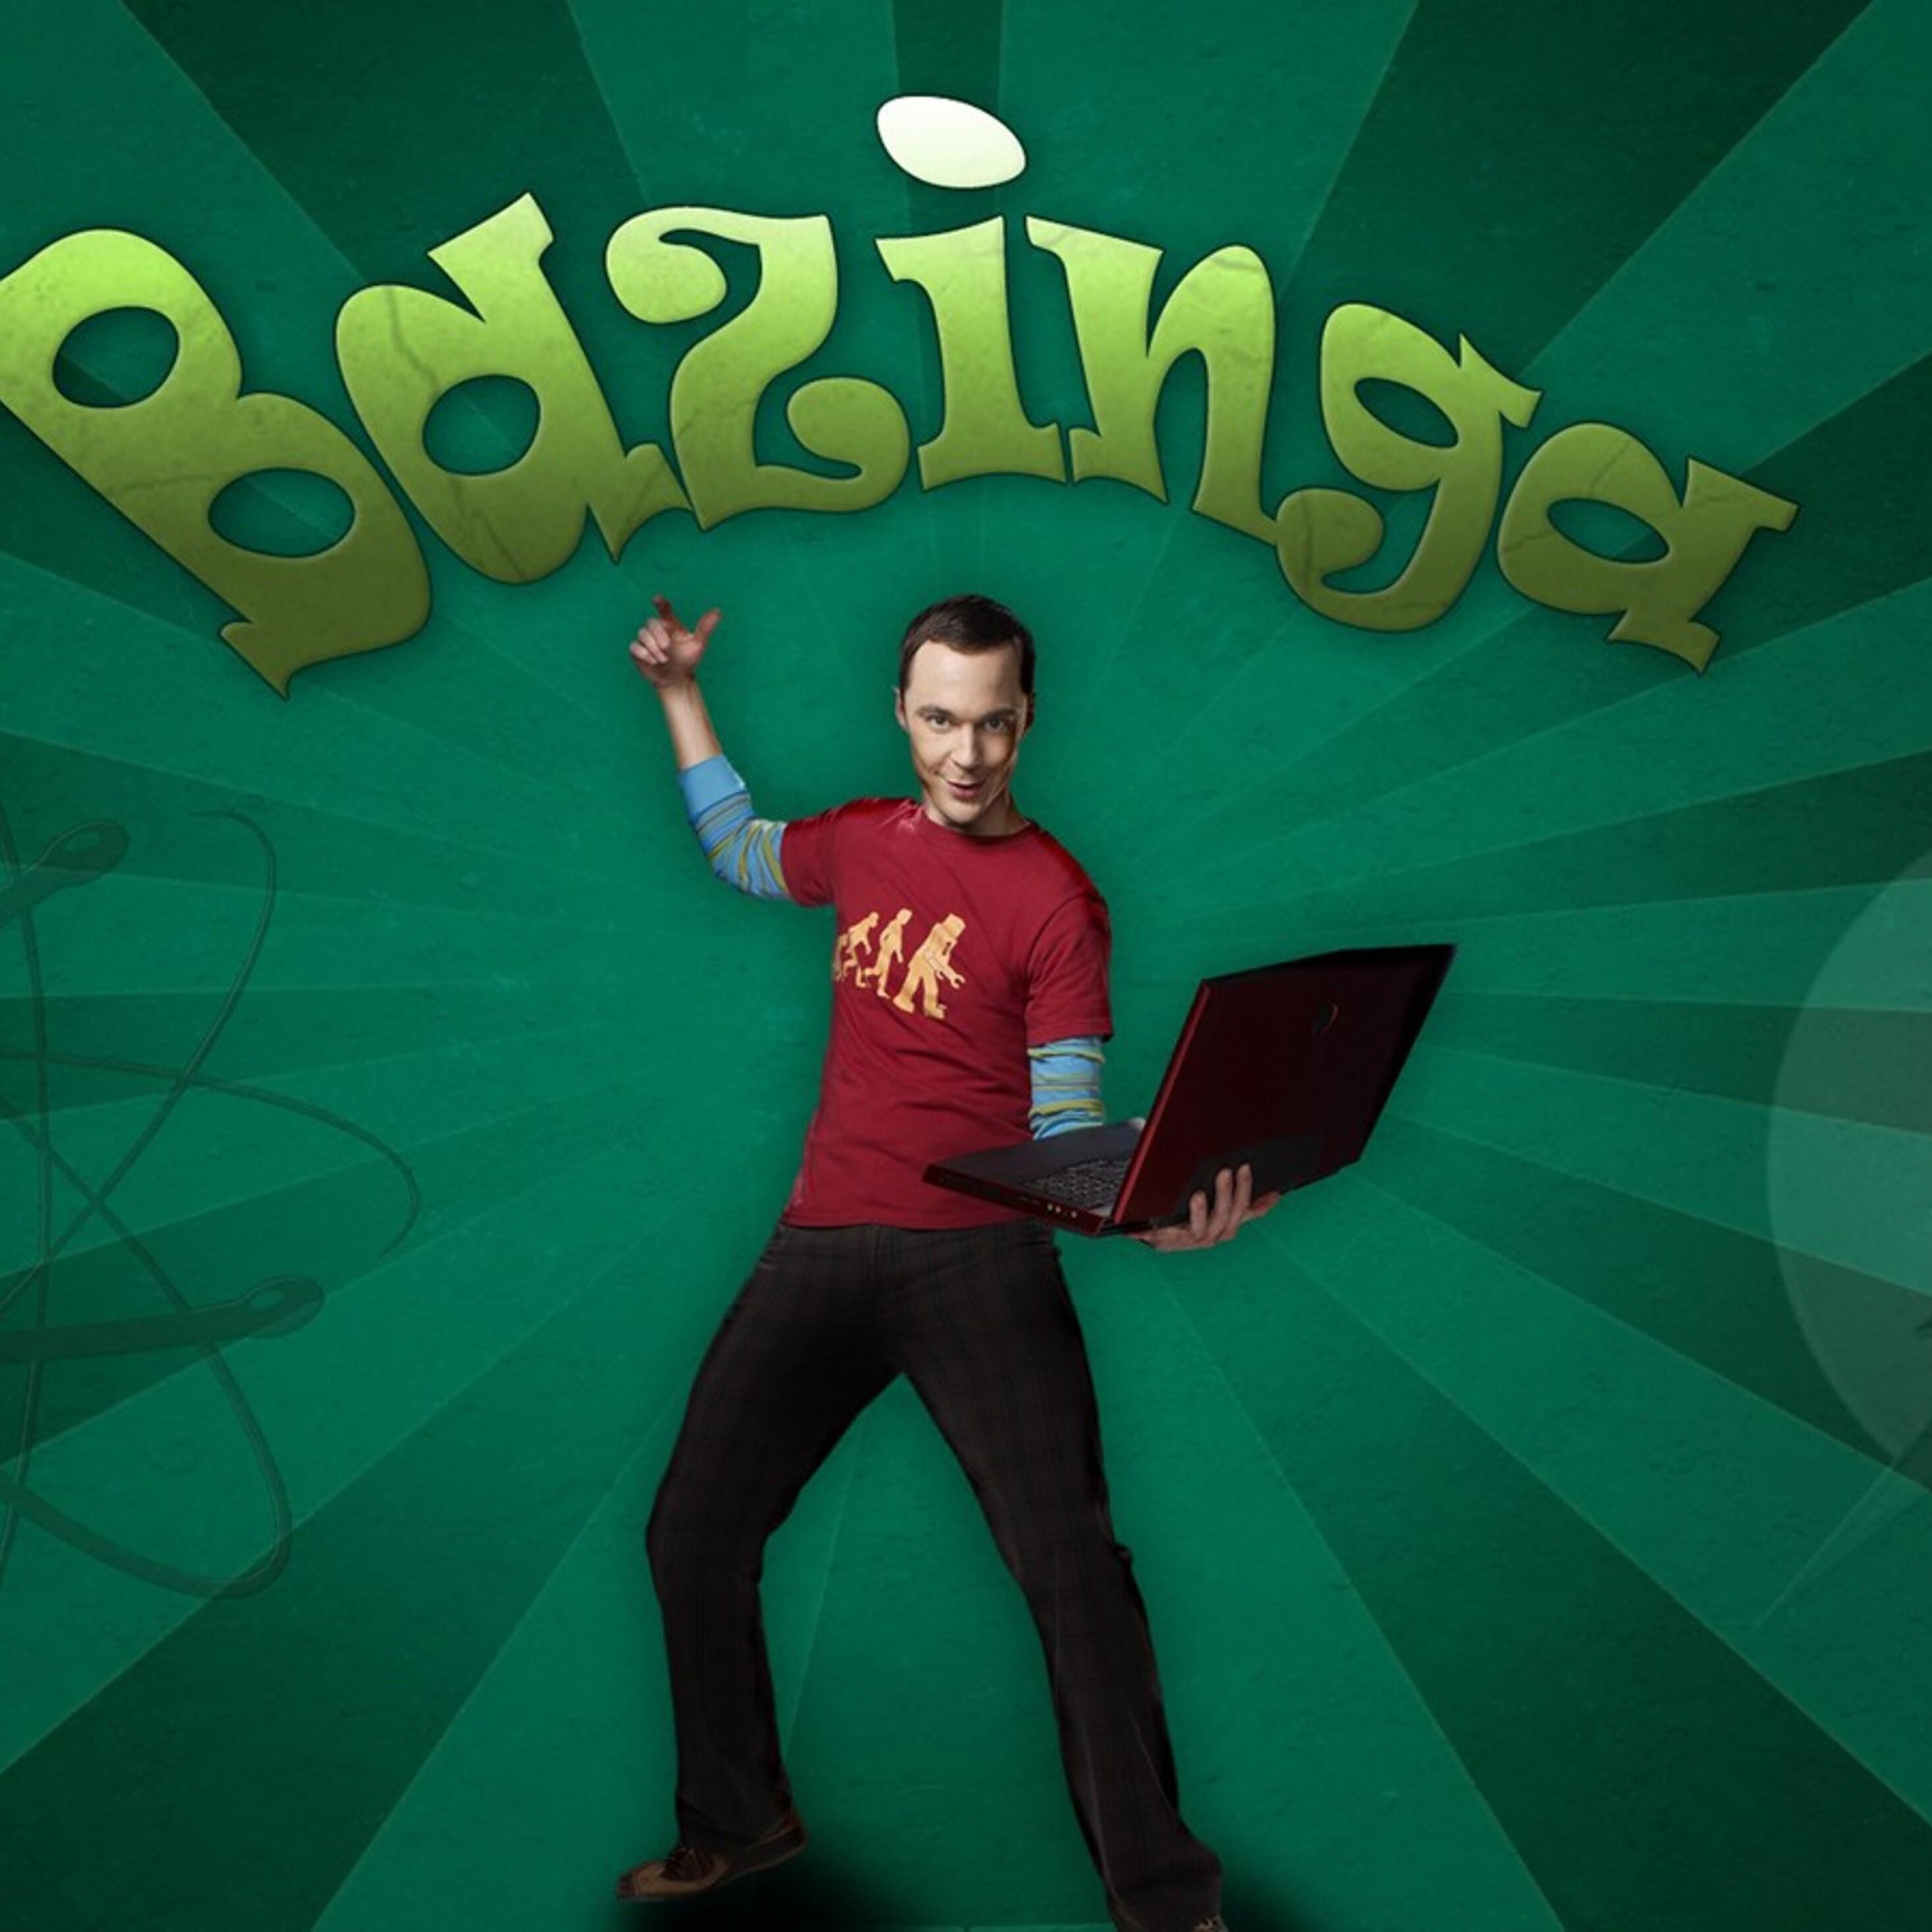 baginza-big-bang.jpg